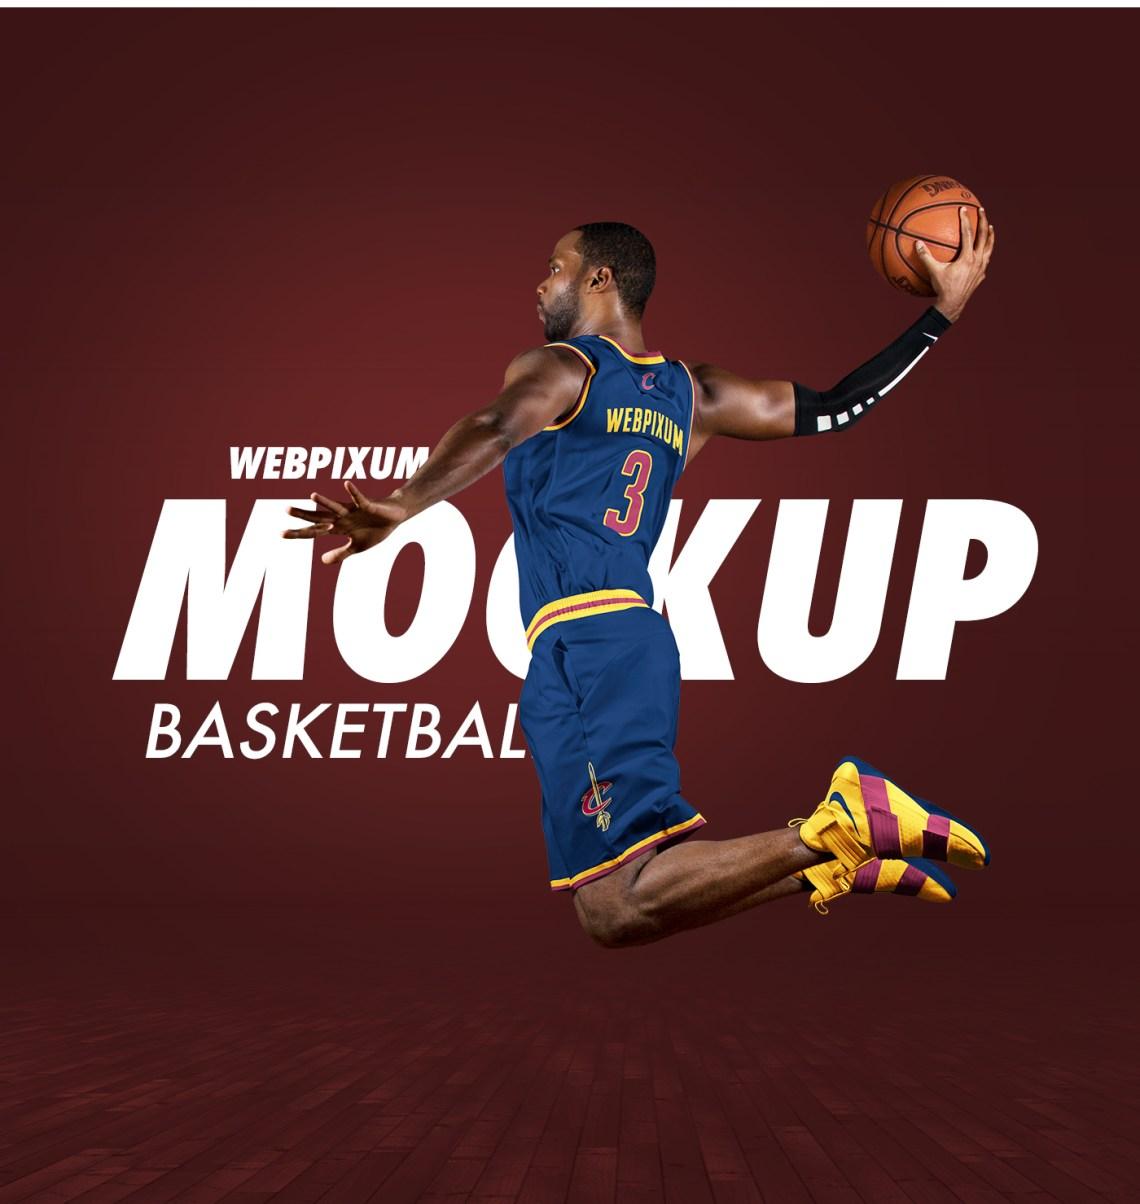 Download NBA Basketball Mockup Templates - FREE PSD Download on Behance